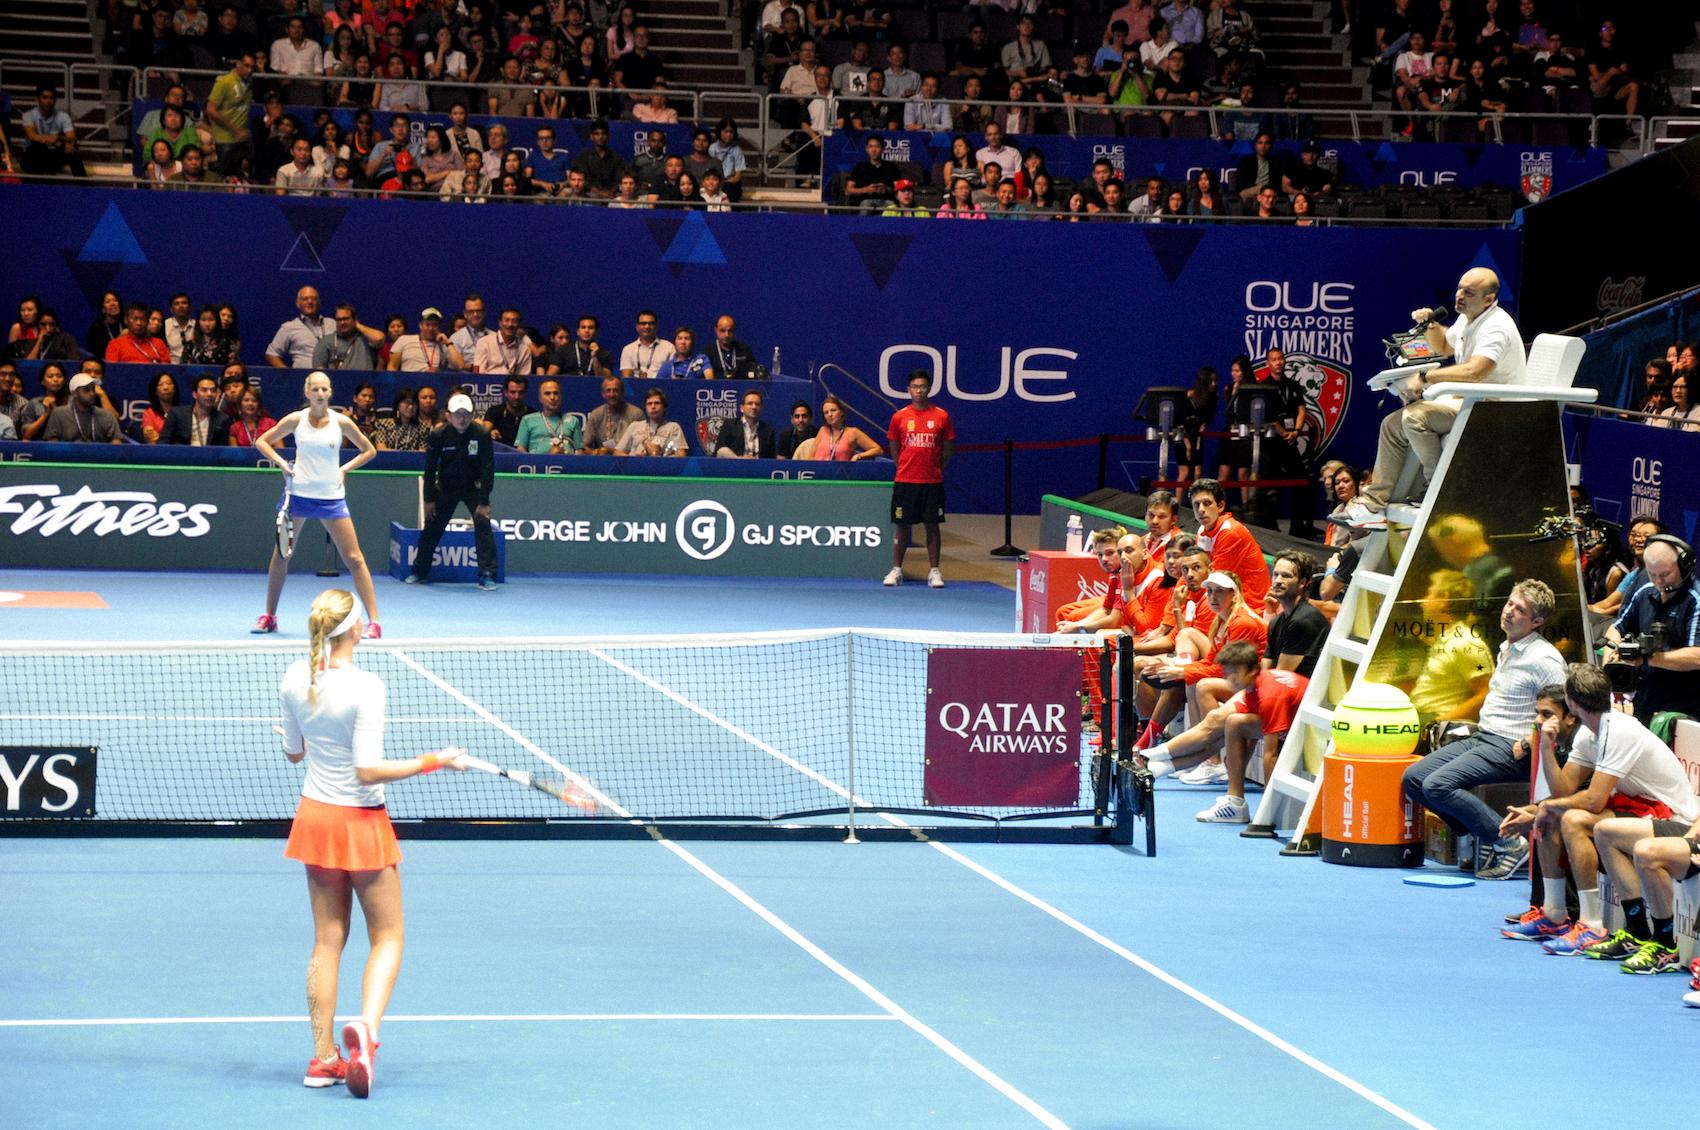 Women's singles match between Kristina Mladenovic and Karolina Pliskova